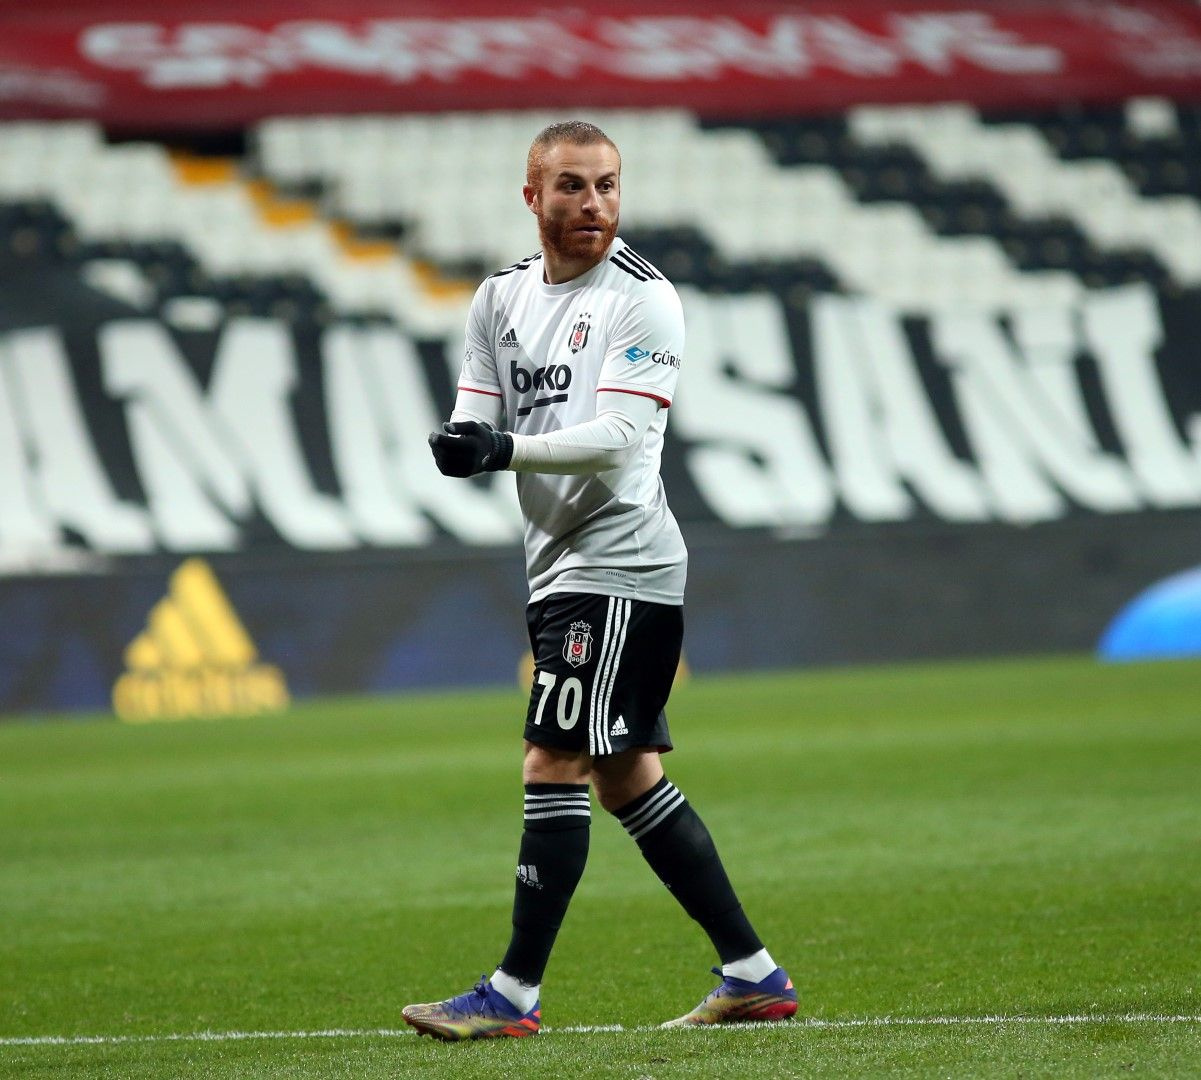 Beşiktaş- Ankaragücü maçı sonrası olay yorum! Beşiktaş'ın ilk golü iptal olmalıydı